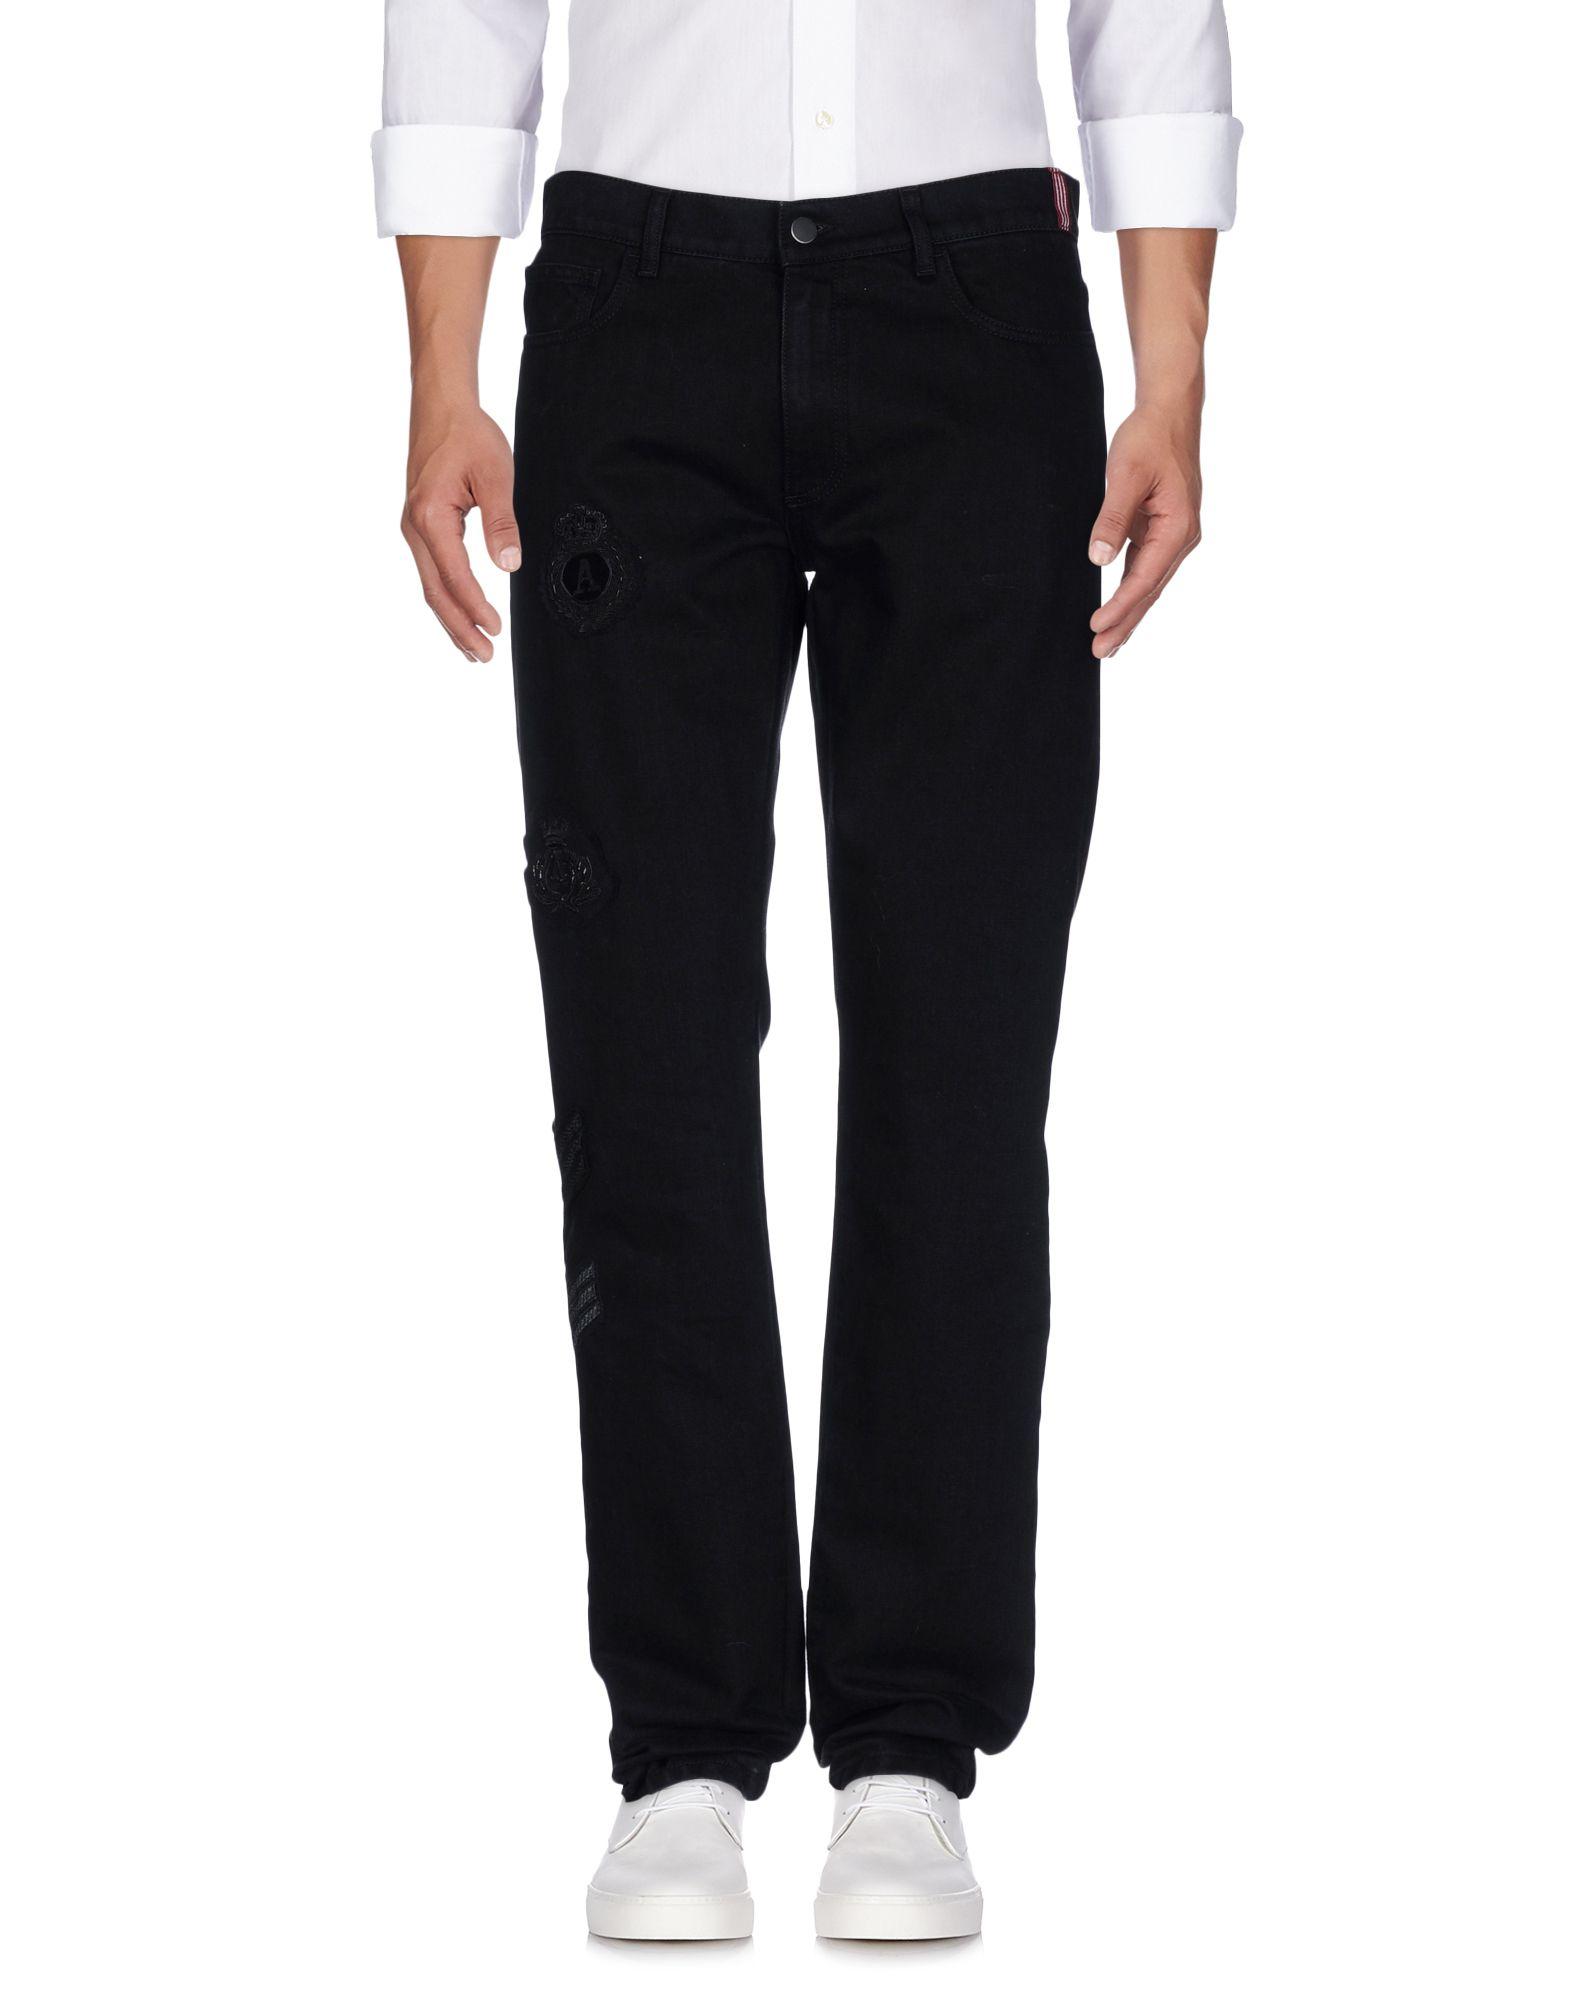 Pantaloni Jeans .Amen. Uomo - Acquista online su